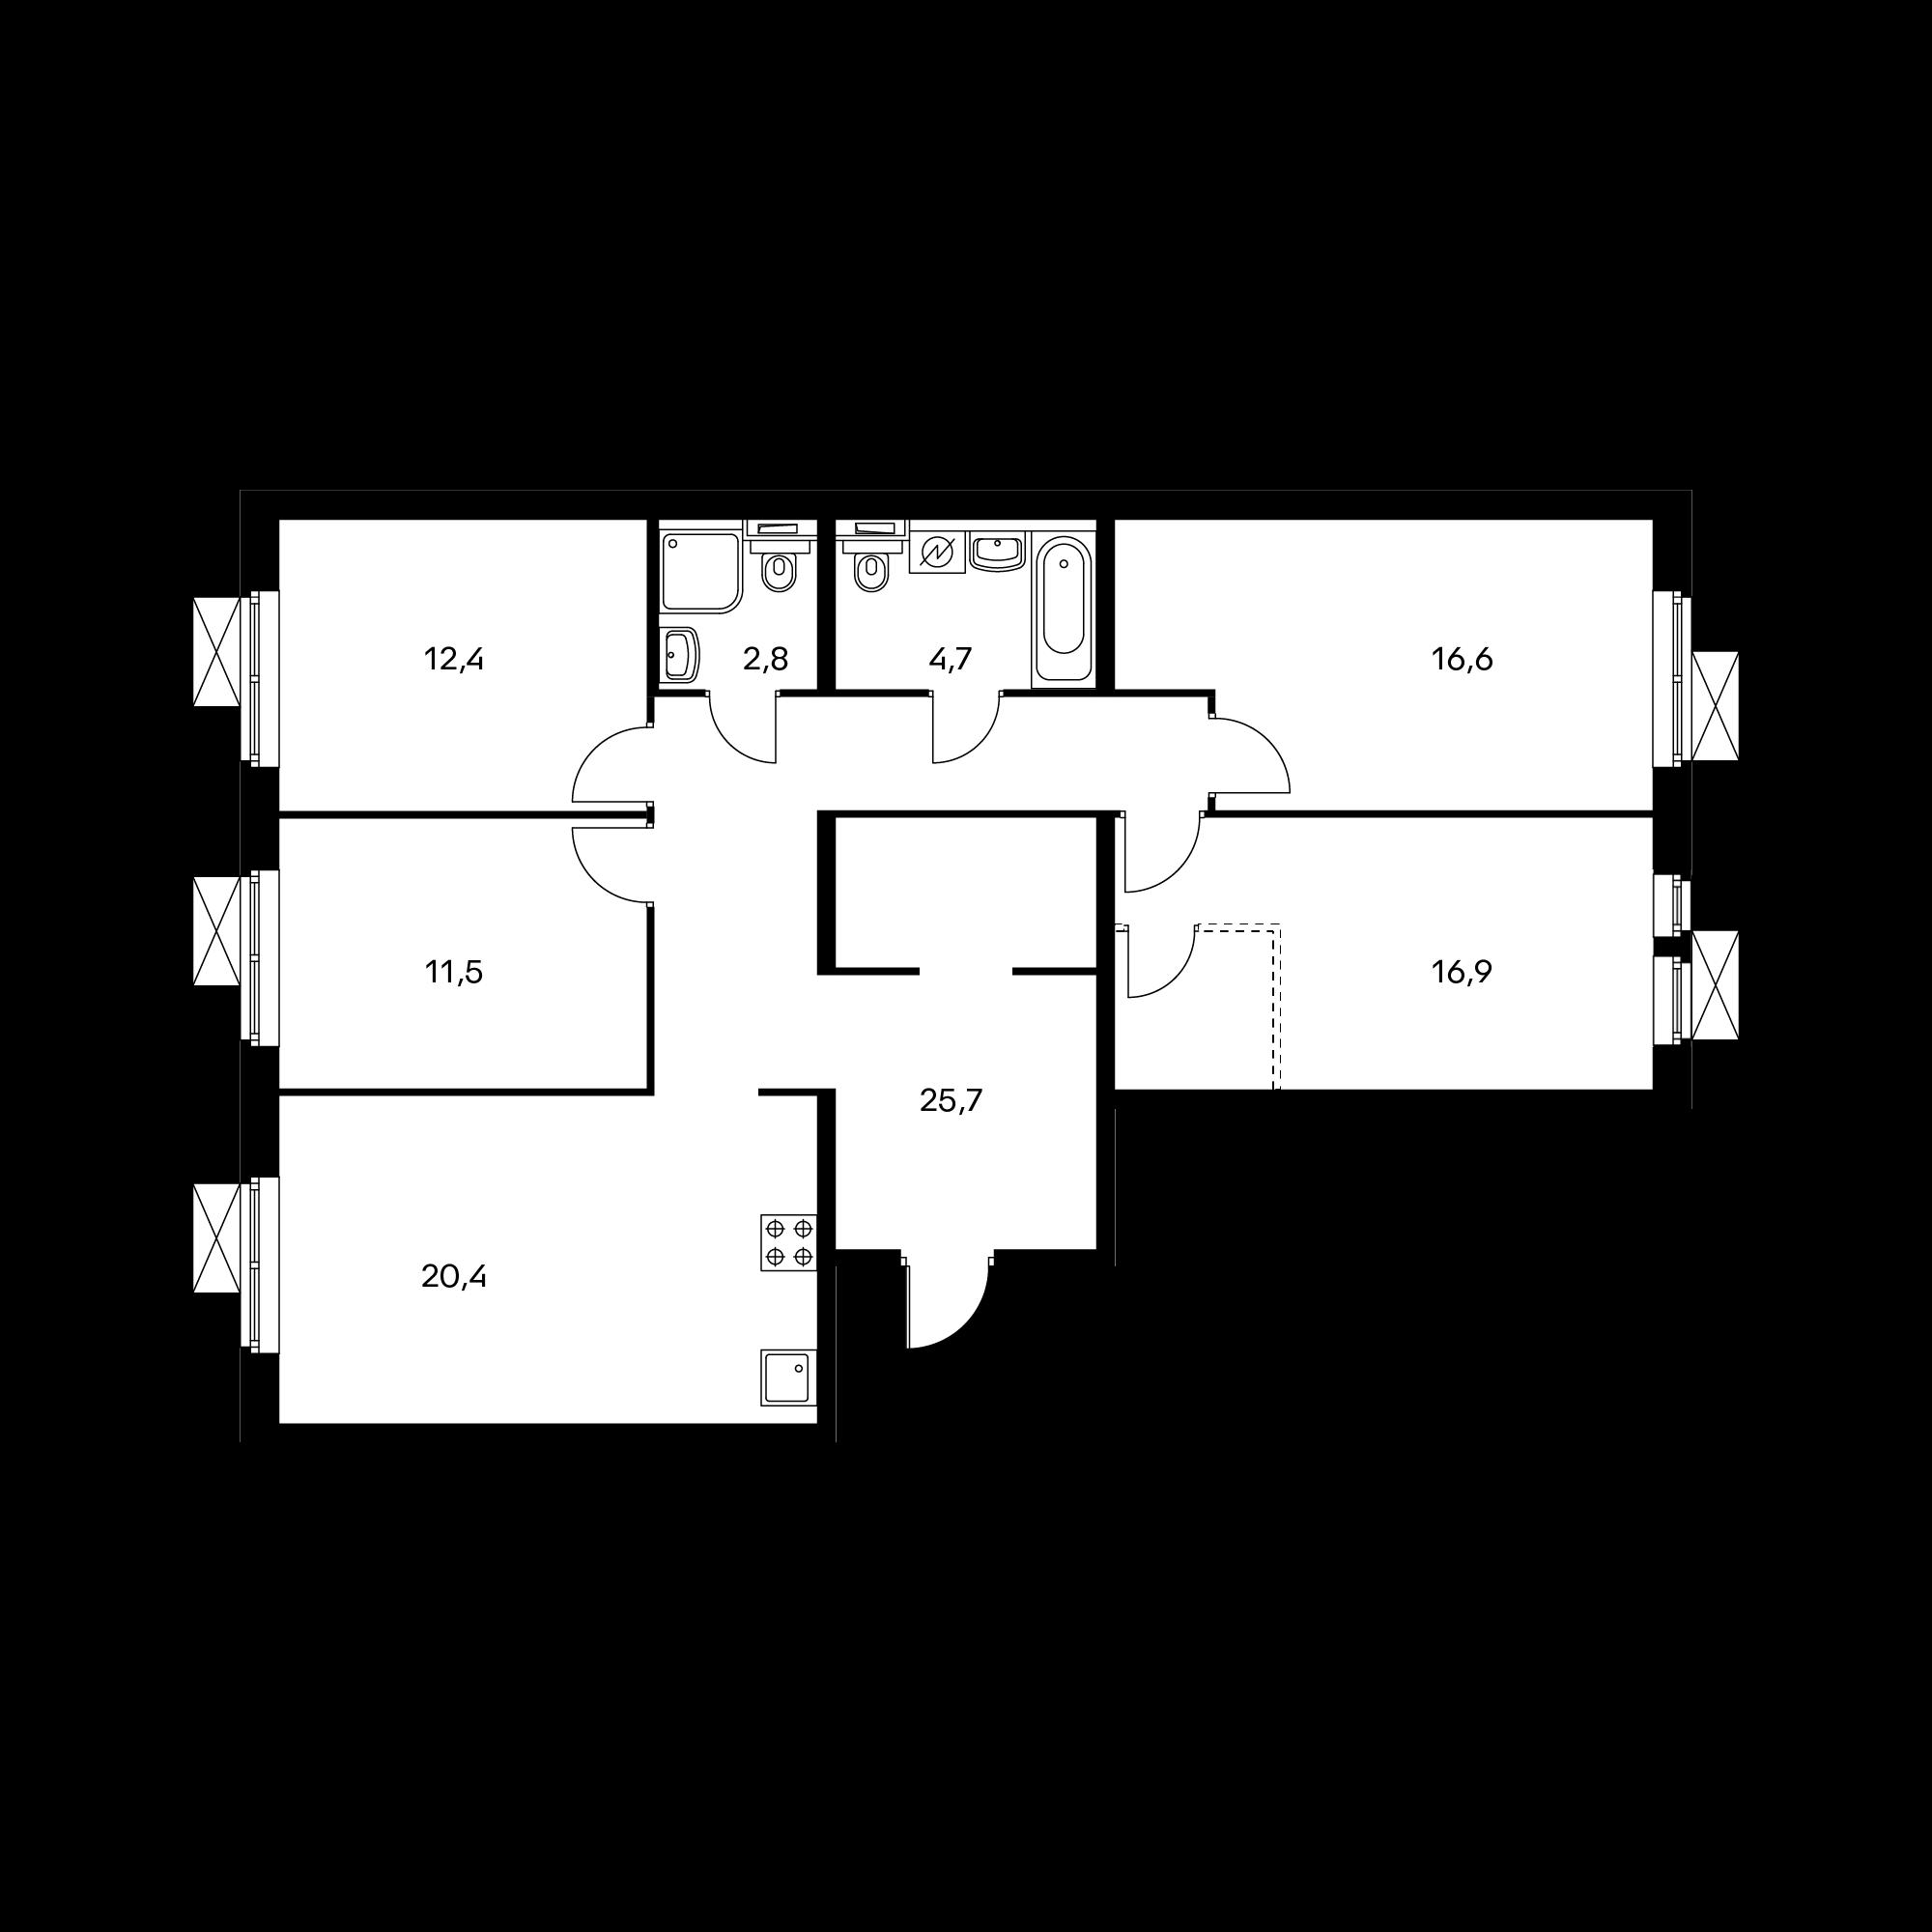 4EL6_9.9-6